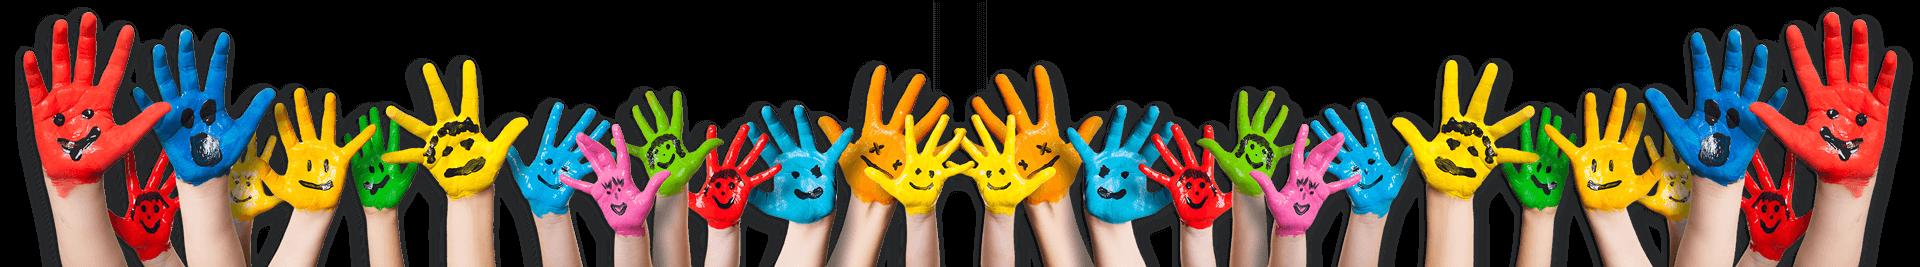 ruke slajder